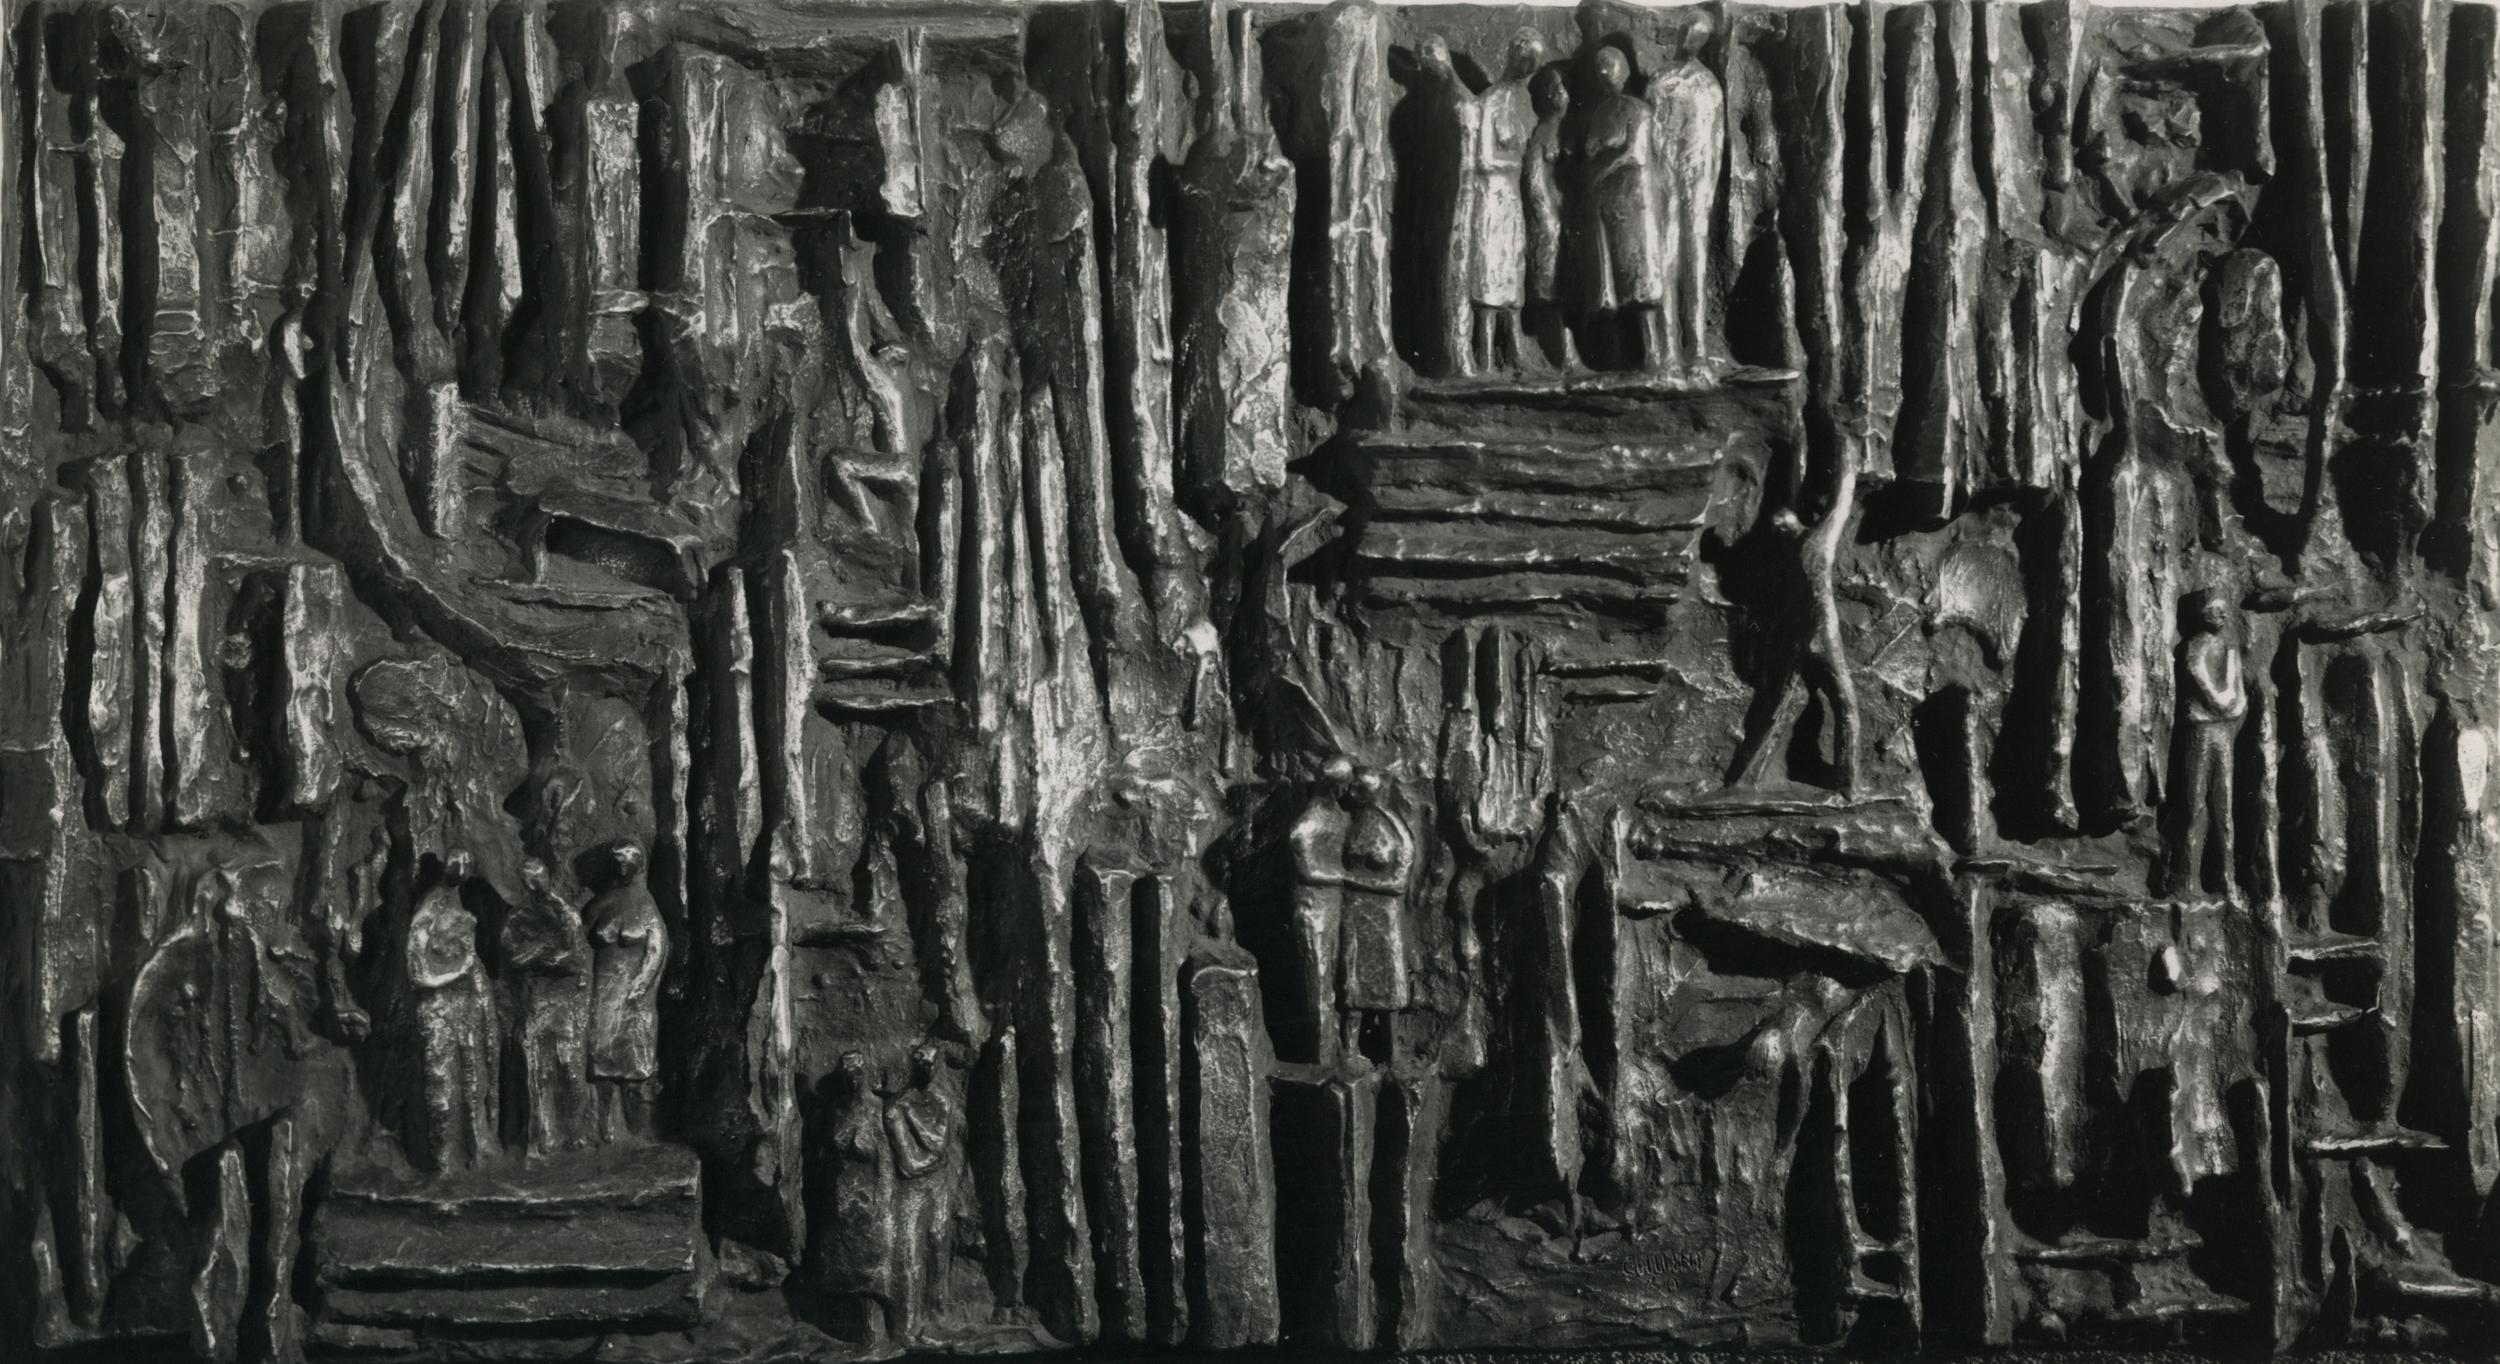 Attitudes of Man (1960)